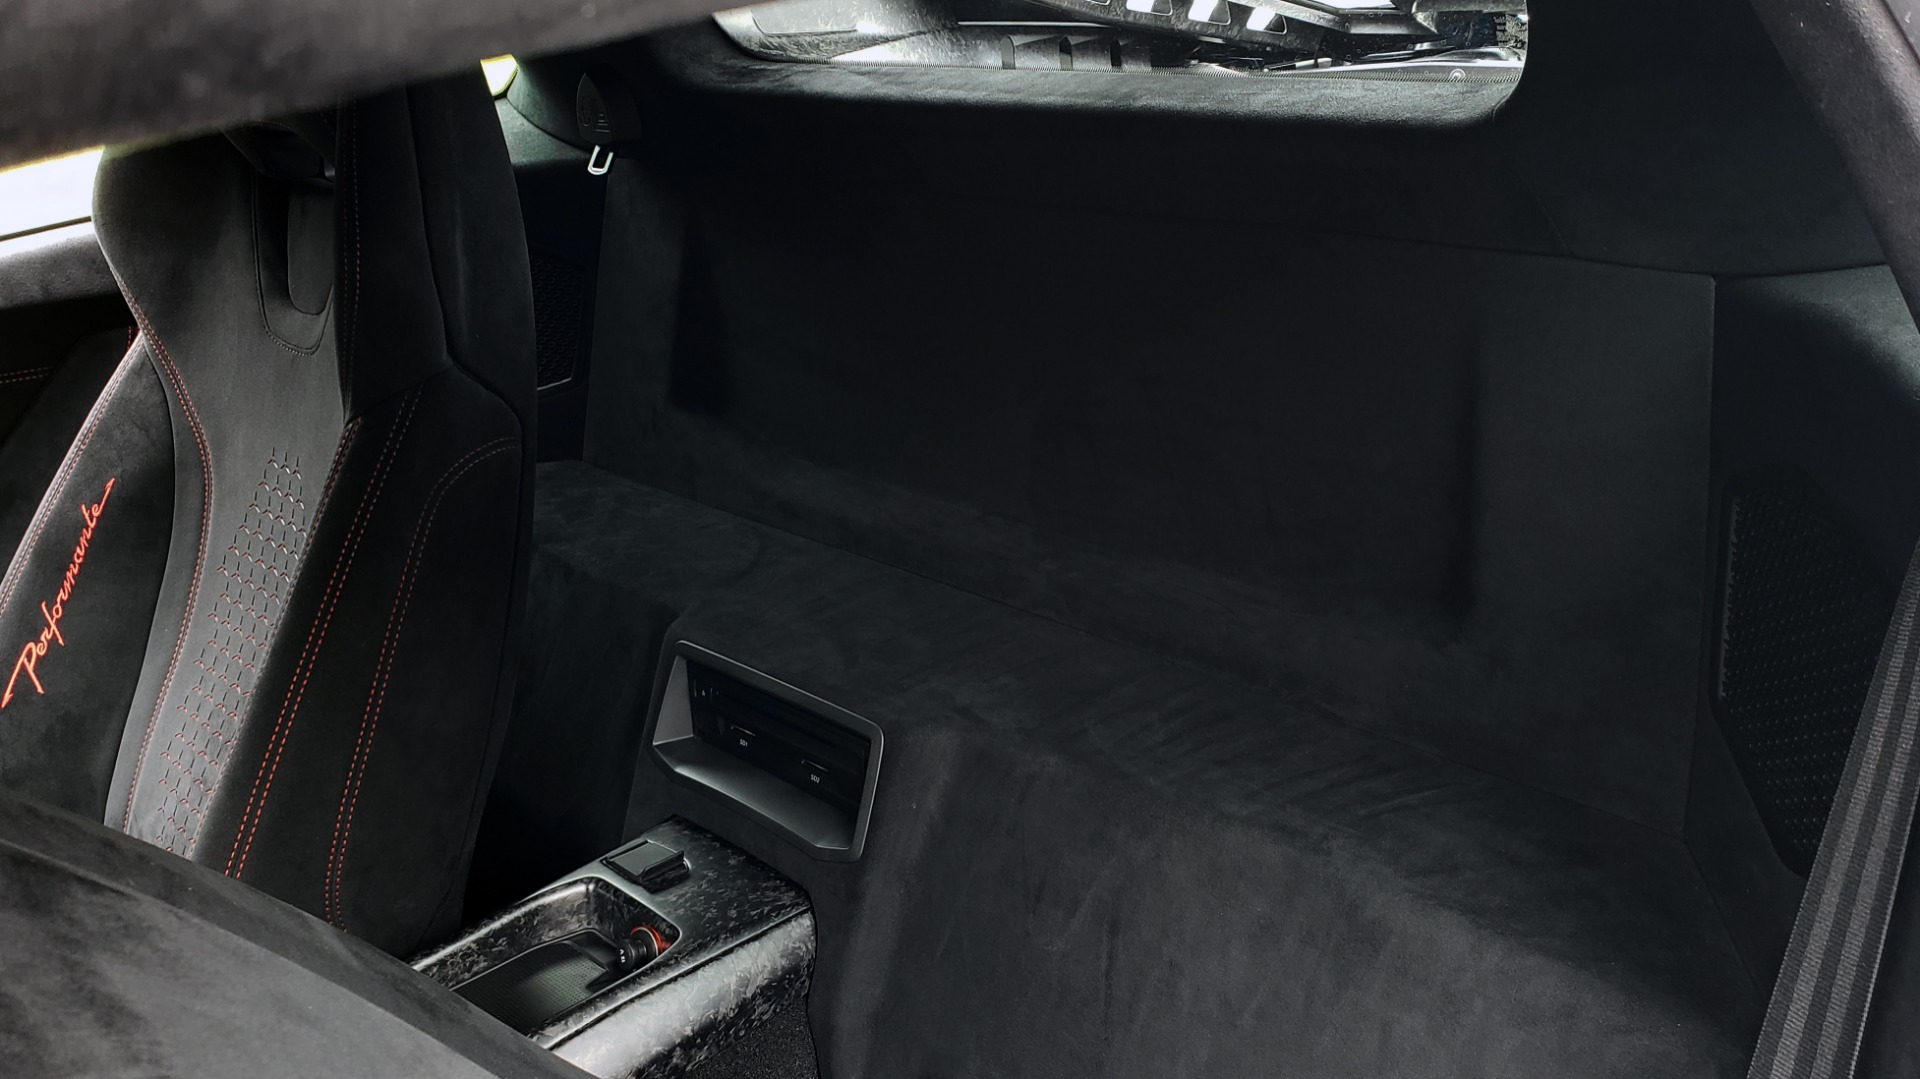 Used 2018 Lamborghini HURACAN PERFORMANTE 5.2L V10 / 630HP / 7-SPD AUTO / AWD / NAV / PREM SND for sale $269,995 at Formula Imports in Charlotte NC 28227 75